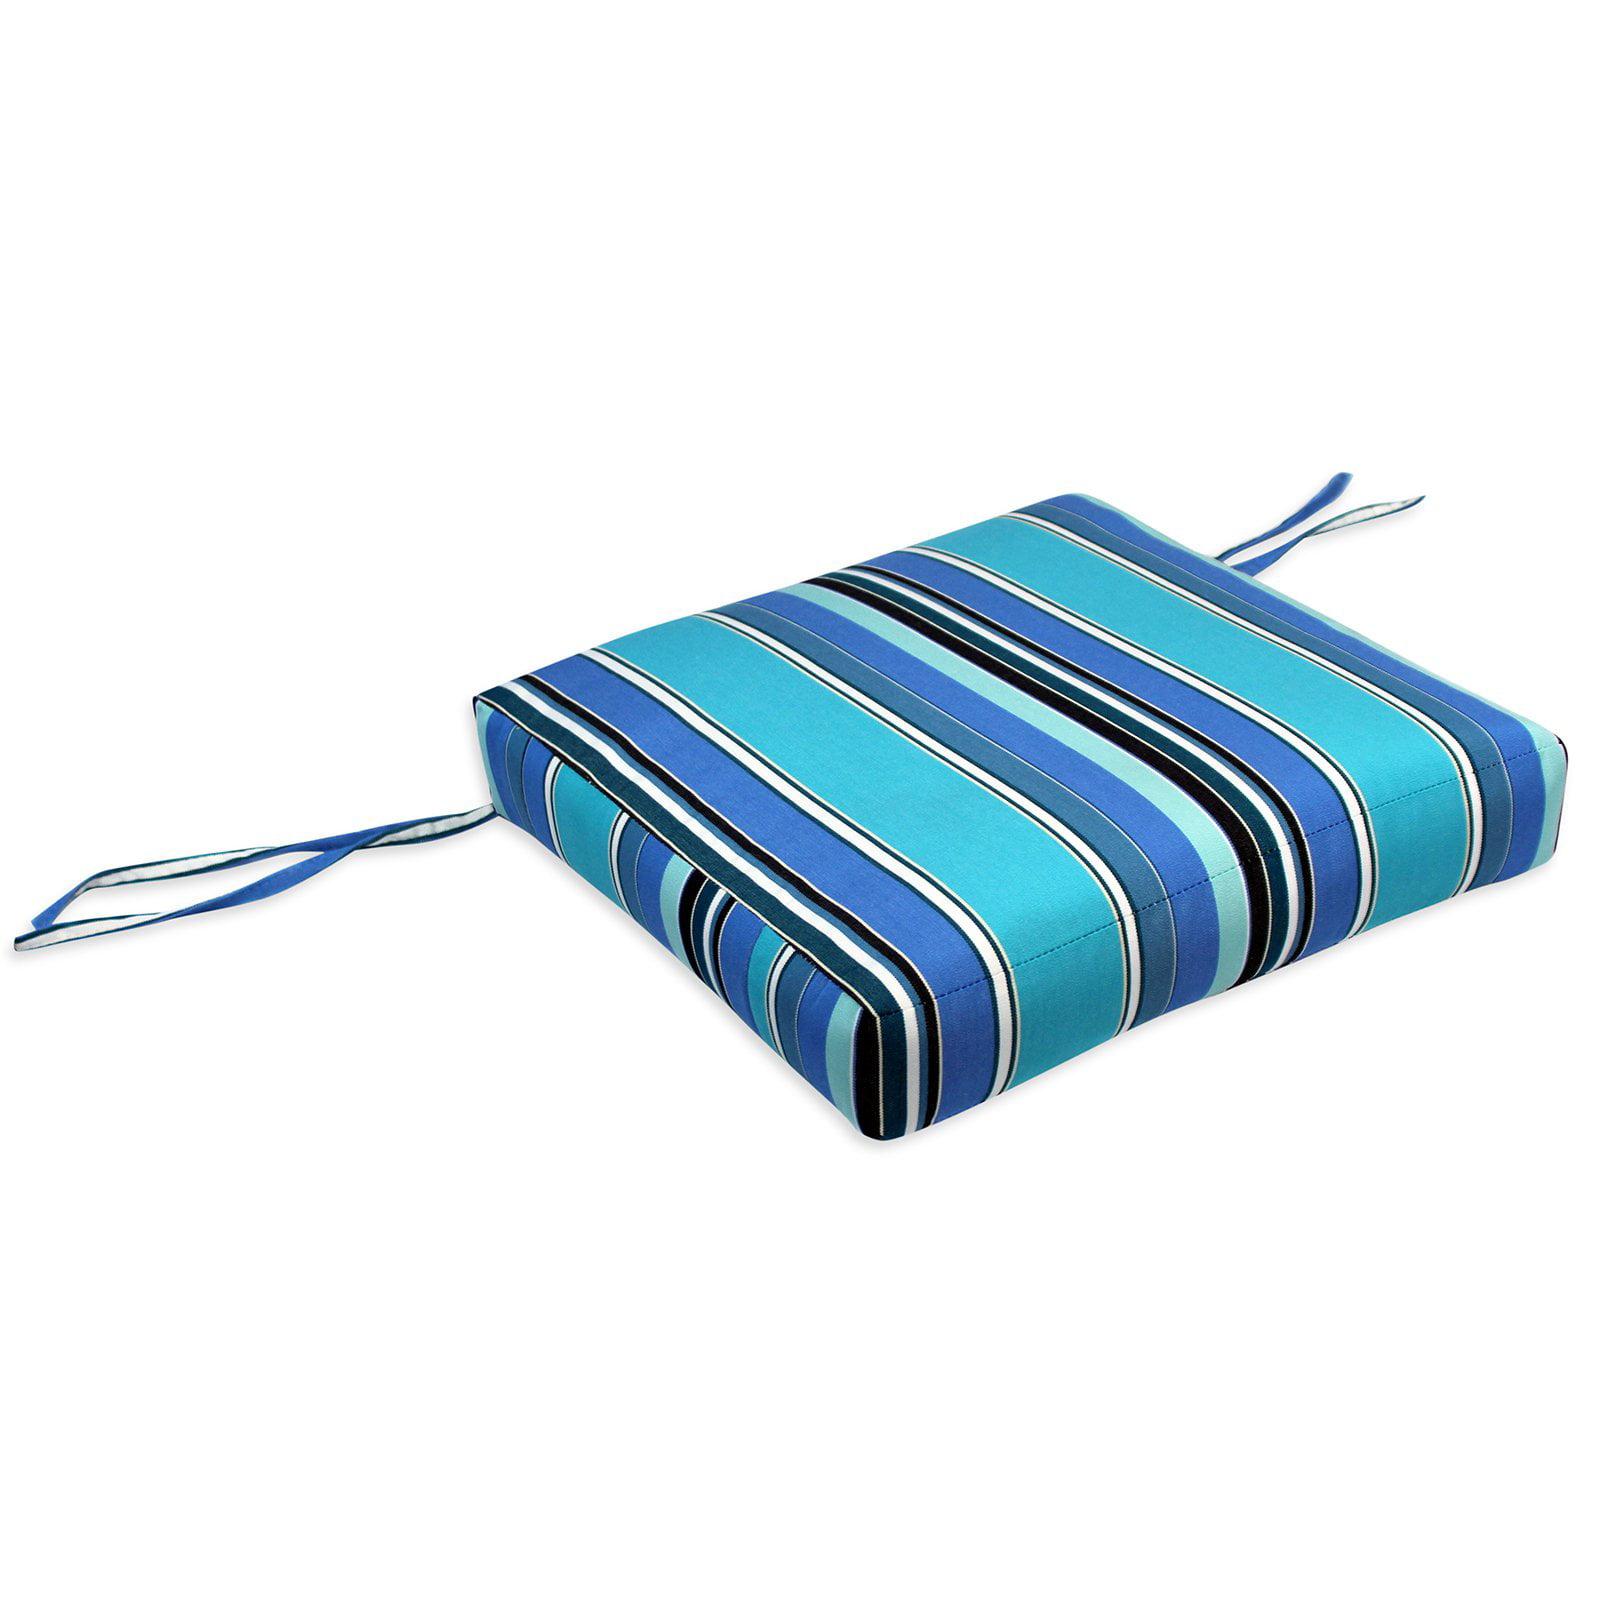 Comfort Classics 18 x 18 in. Sunbrella Boxed Style Seat Cushion ...